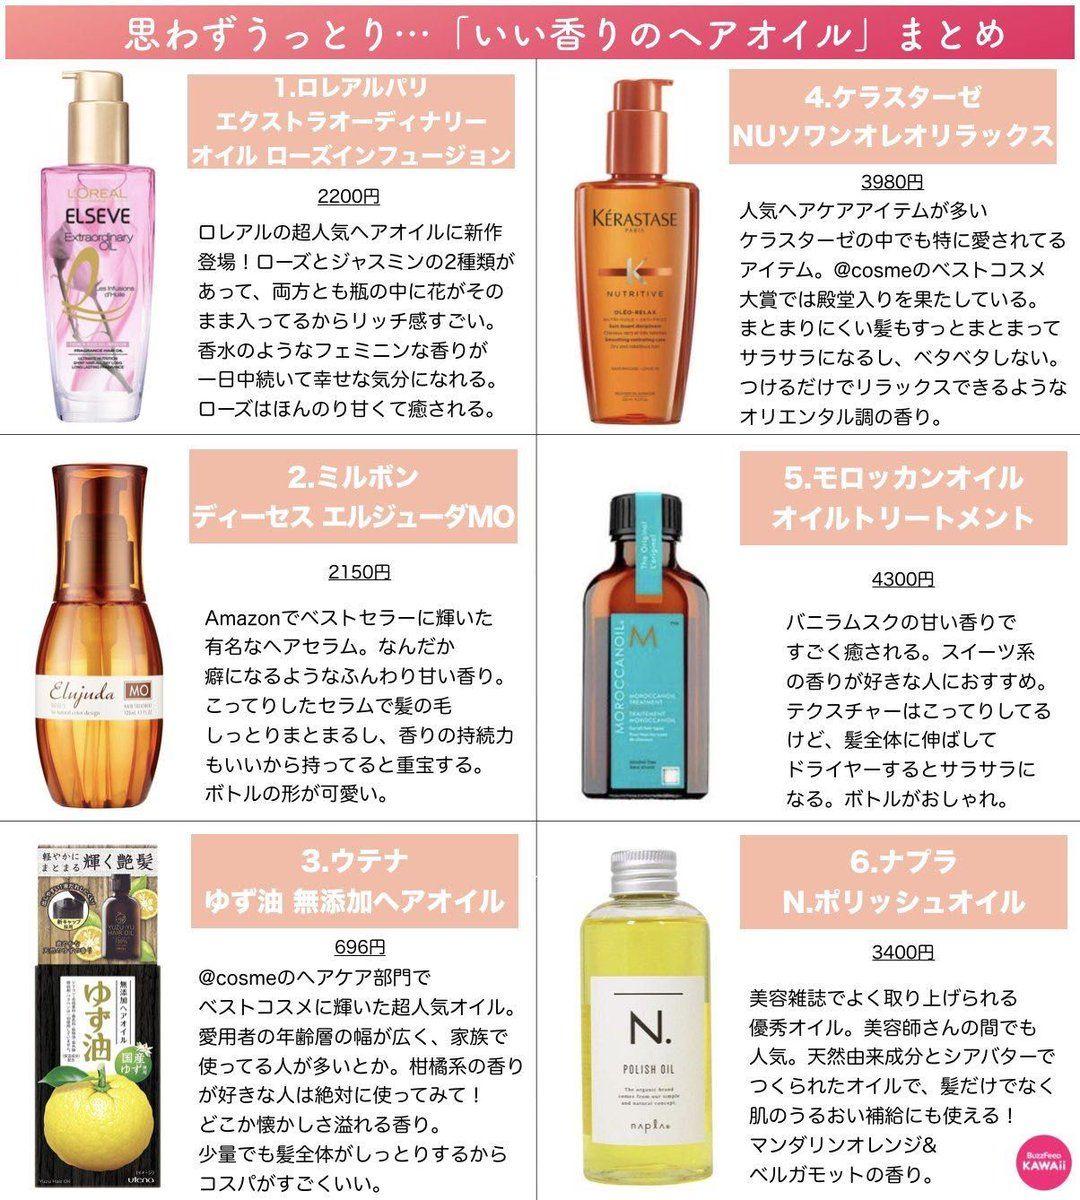 Buzzfeed Kawaii On 化粧品 おすすめ 日本のメイクアップ